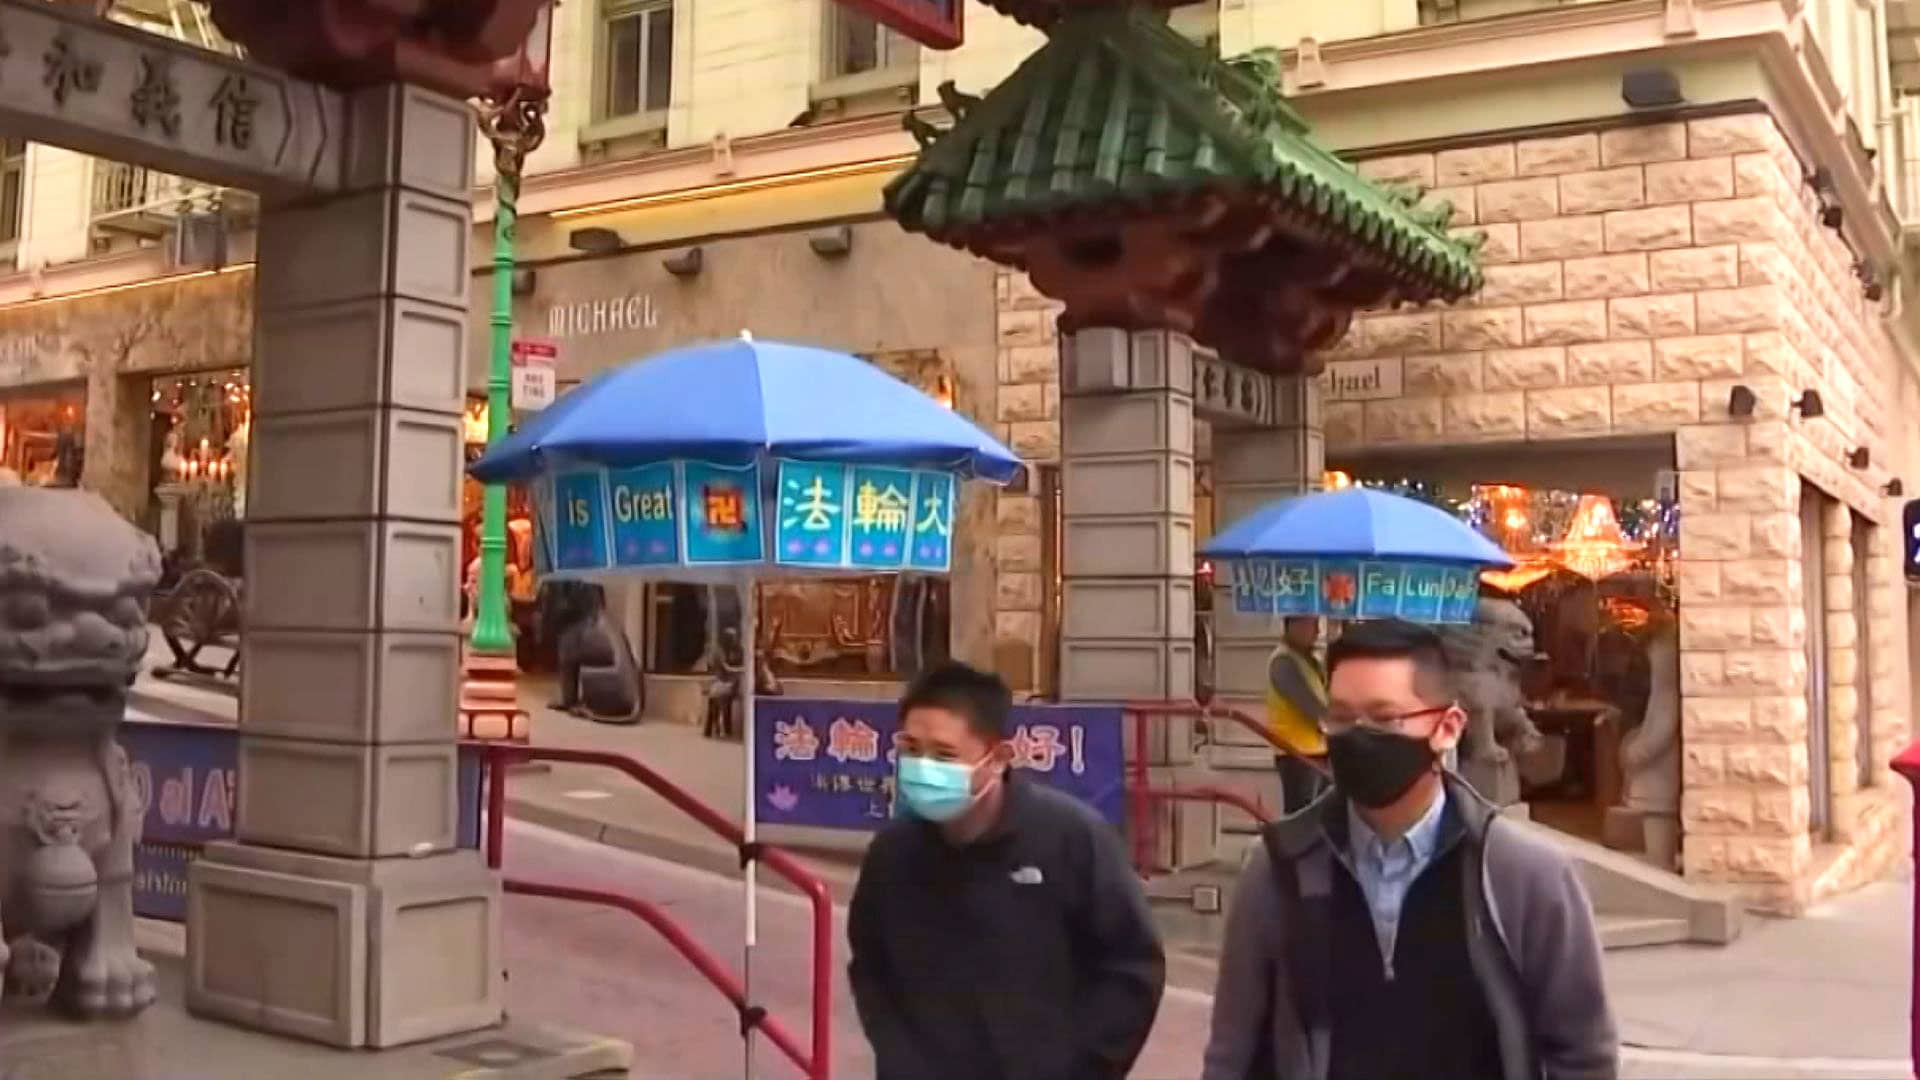 A street scene in Chinatown, San Francisco